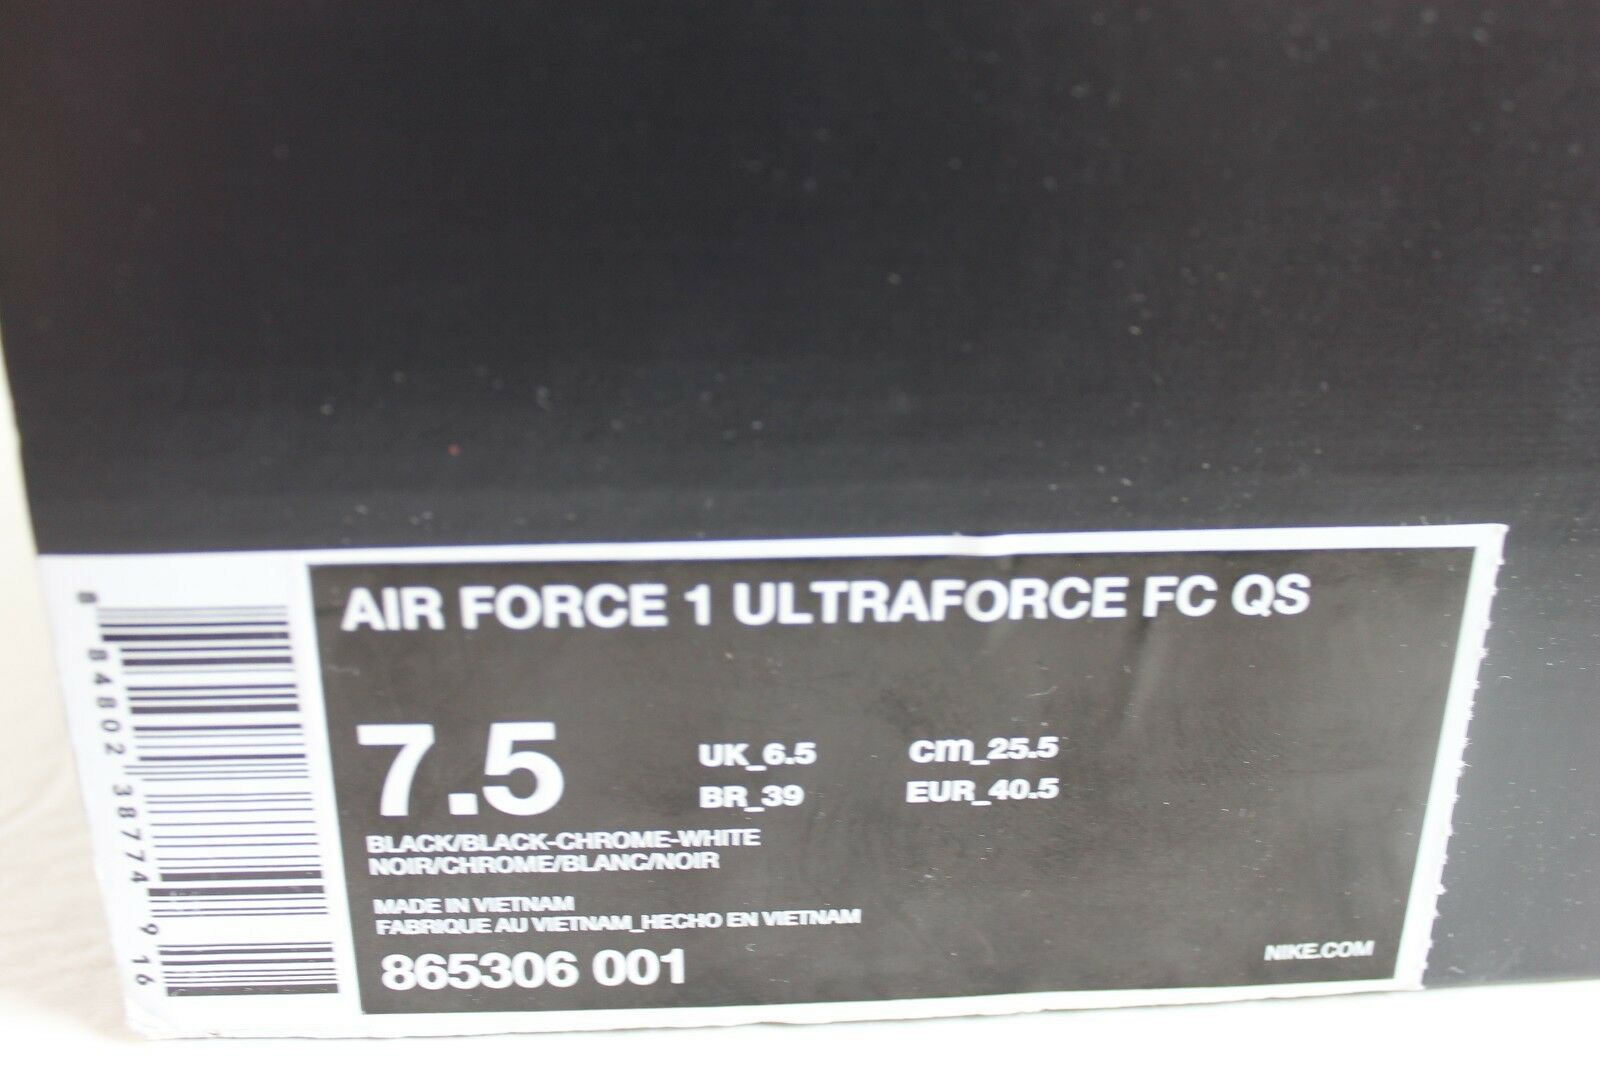 NIKE AIR FORCE 1 ULTRAFORCE FC QS BLACK-CHROME-WHITE SZ 7.5 [865306-001]